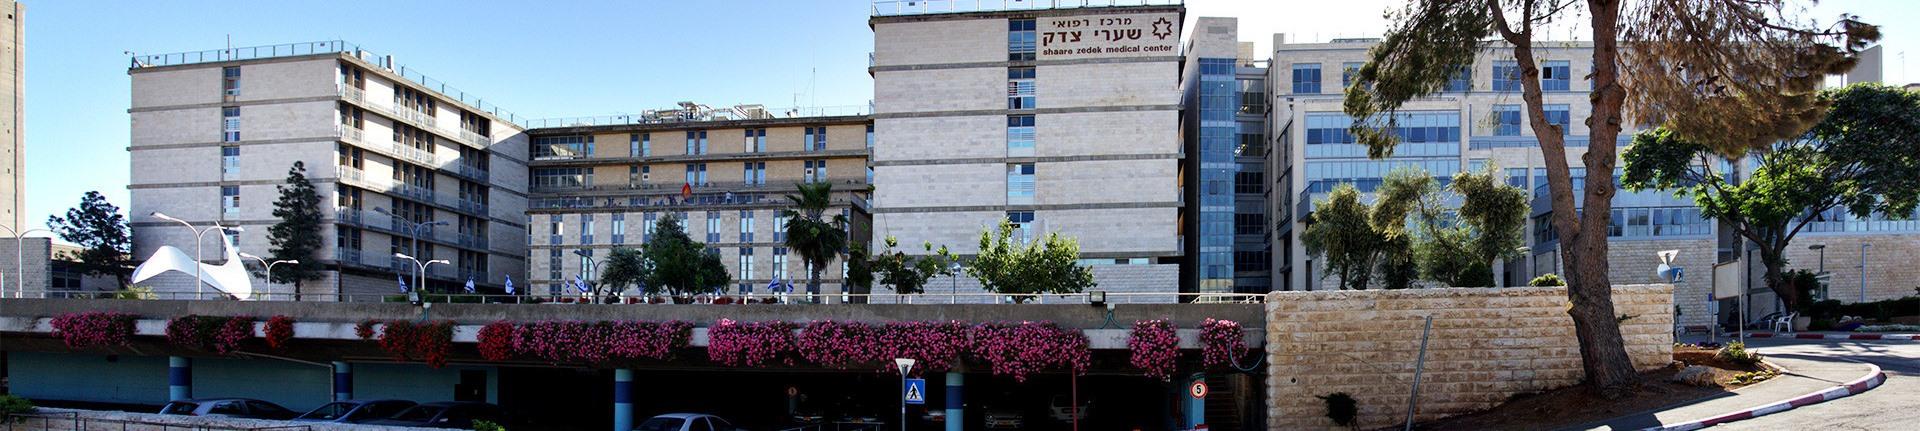 больница шаарей-цедек